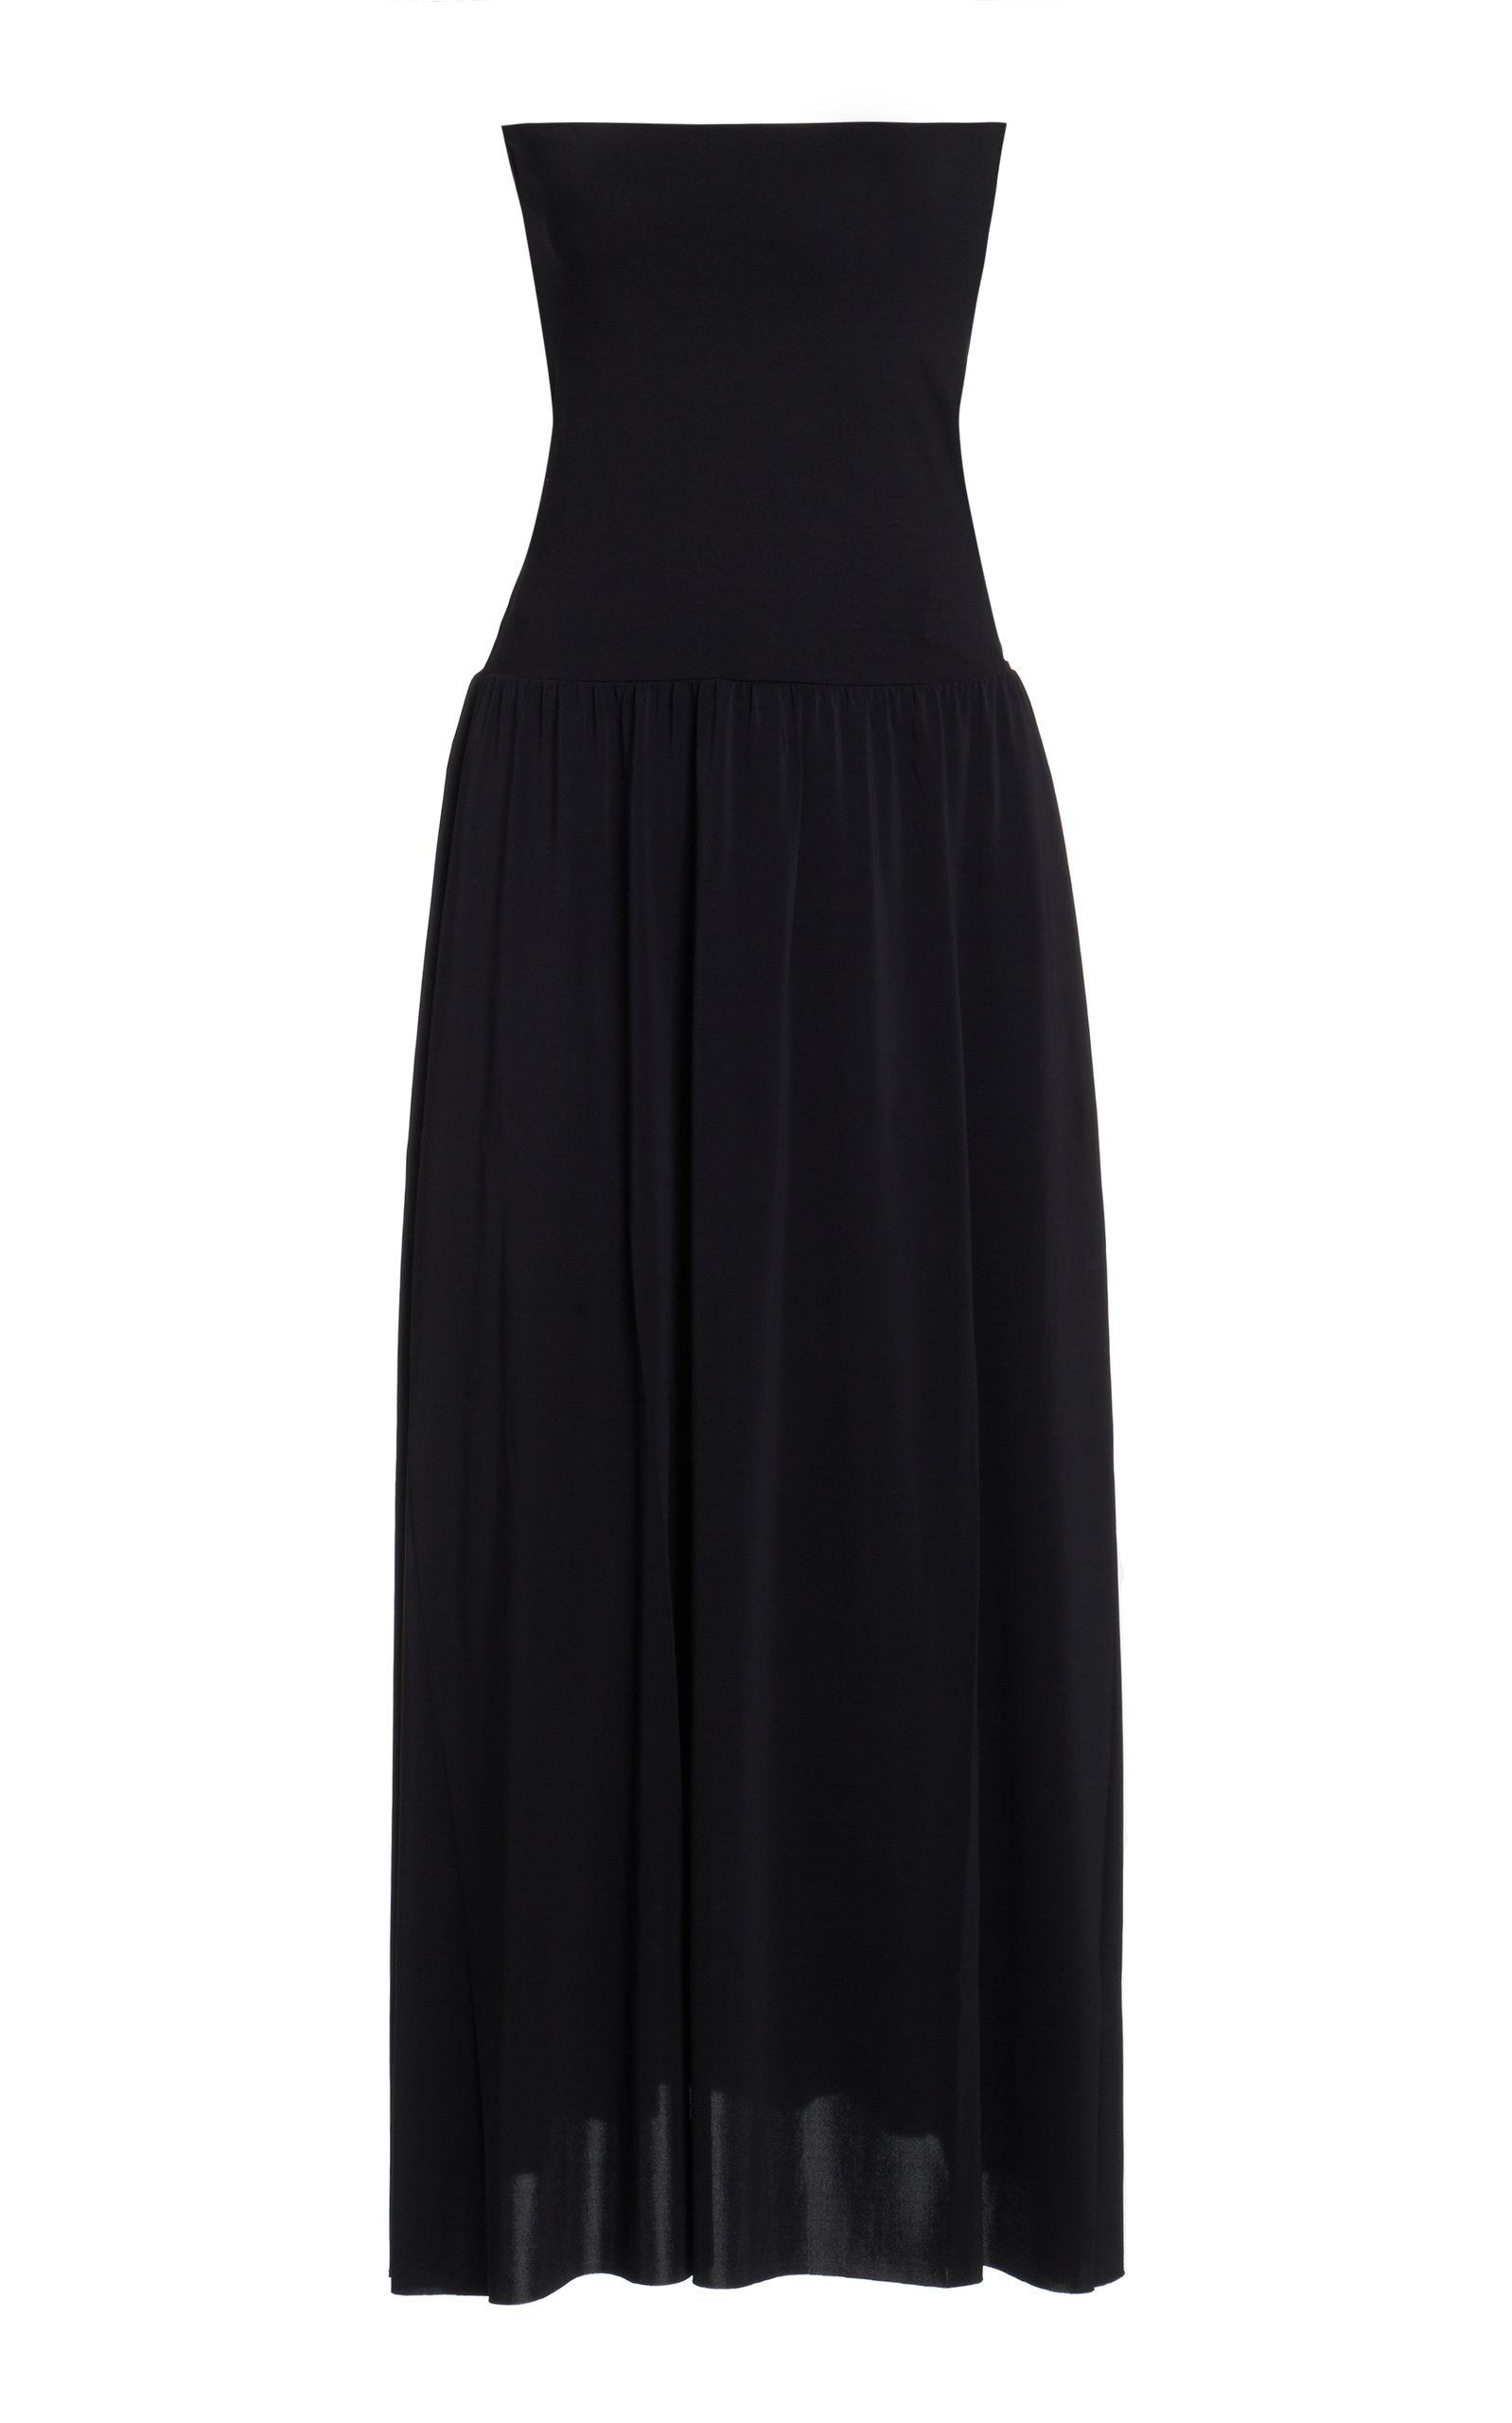 Eres – Women's Oda Jersey Swimsuit Cover Up – Black – Moda Operandi